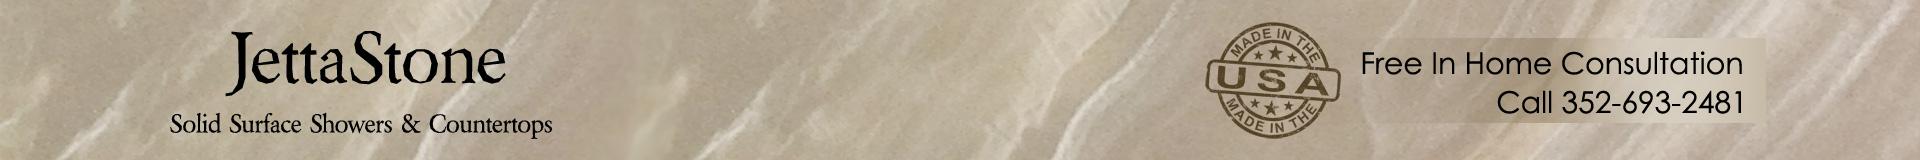 JettaStone Solid Surface